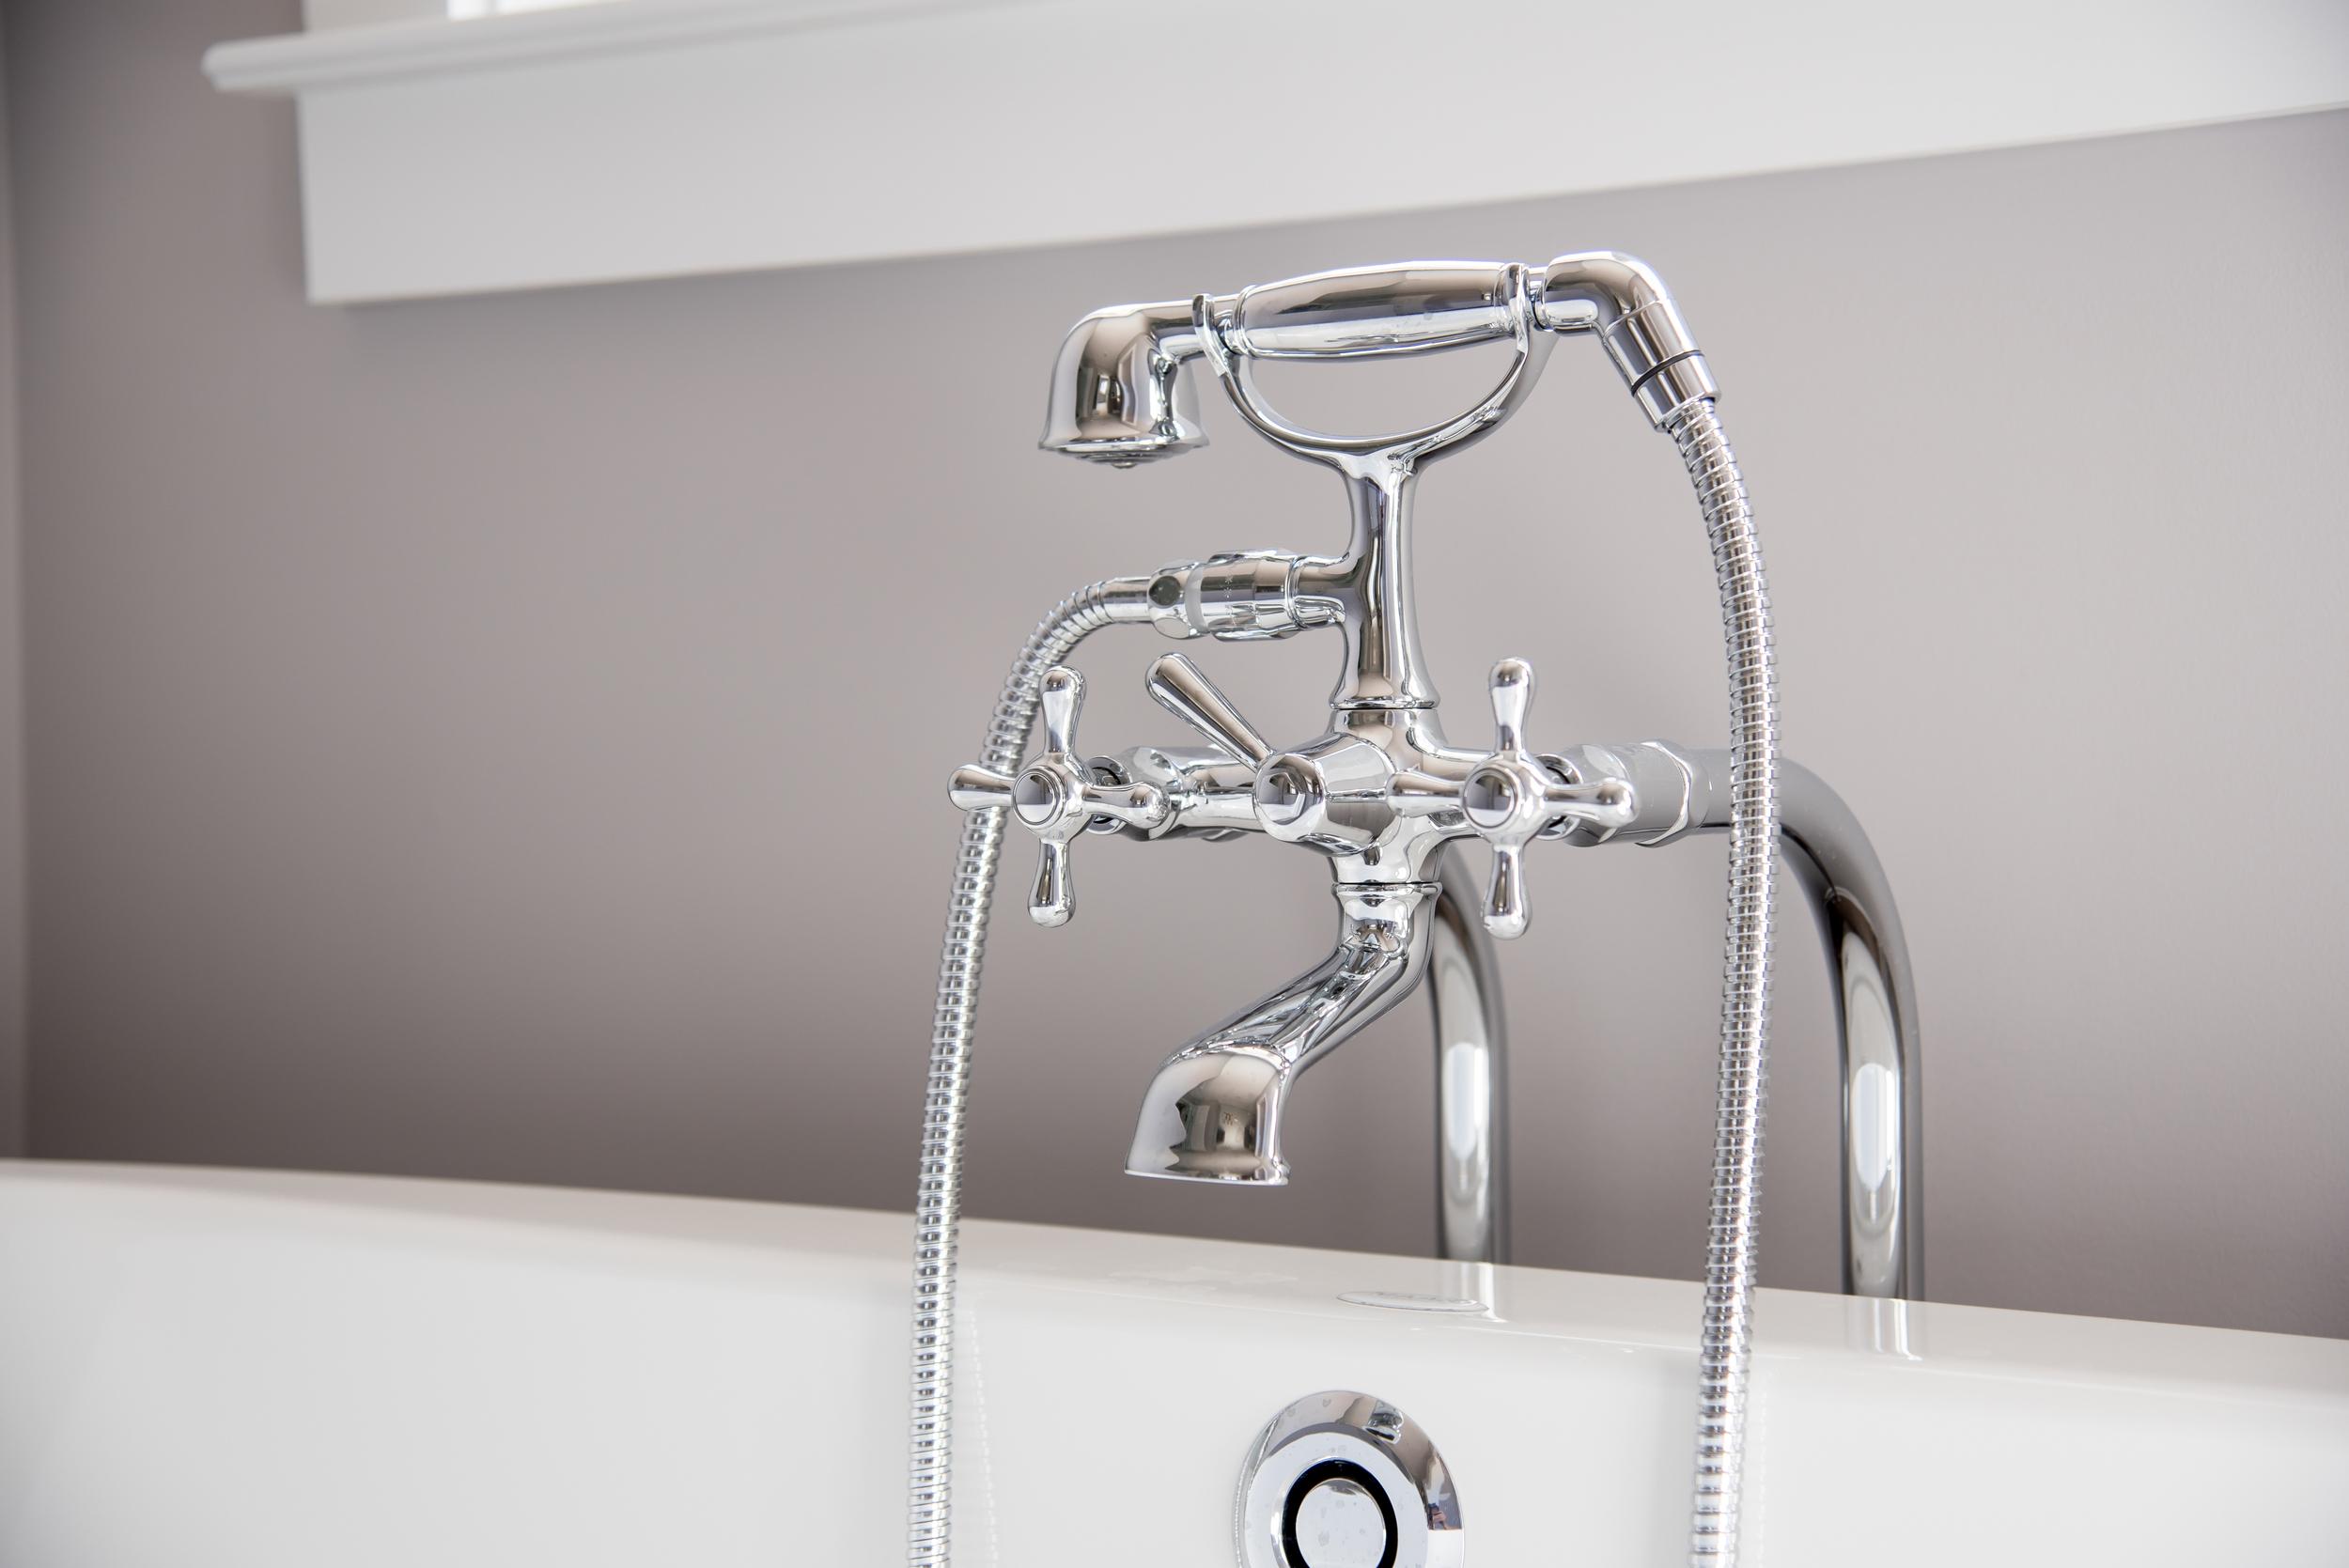 Detail photograph of Plumbing fixture